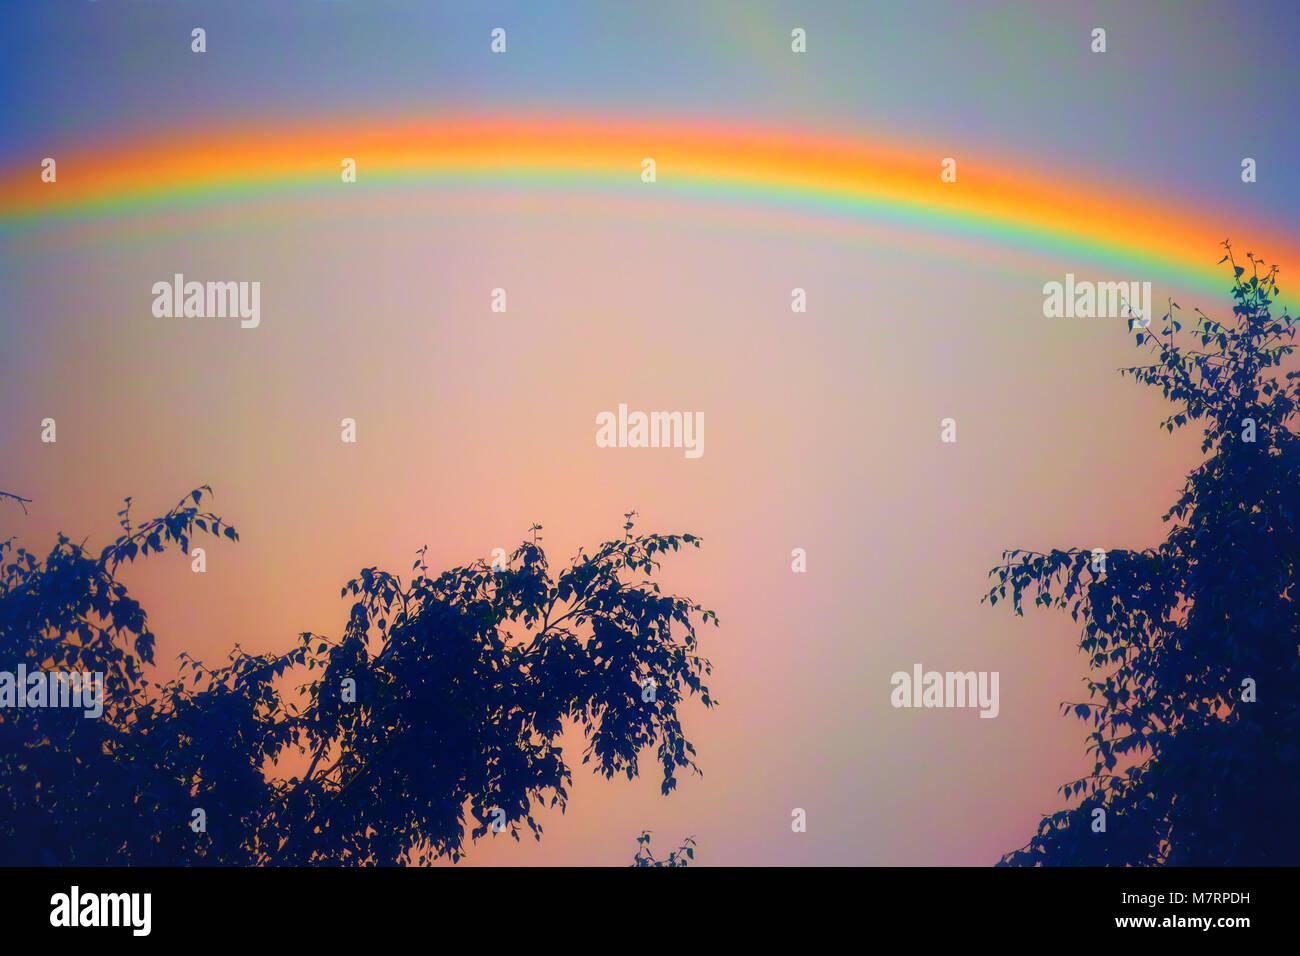 Arc-en-ciel sur ciel bleu. Phénomène naturel. Banque D'Images